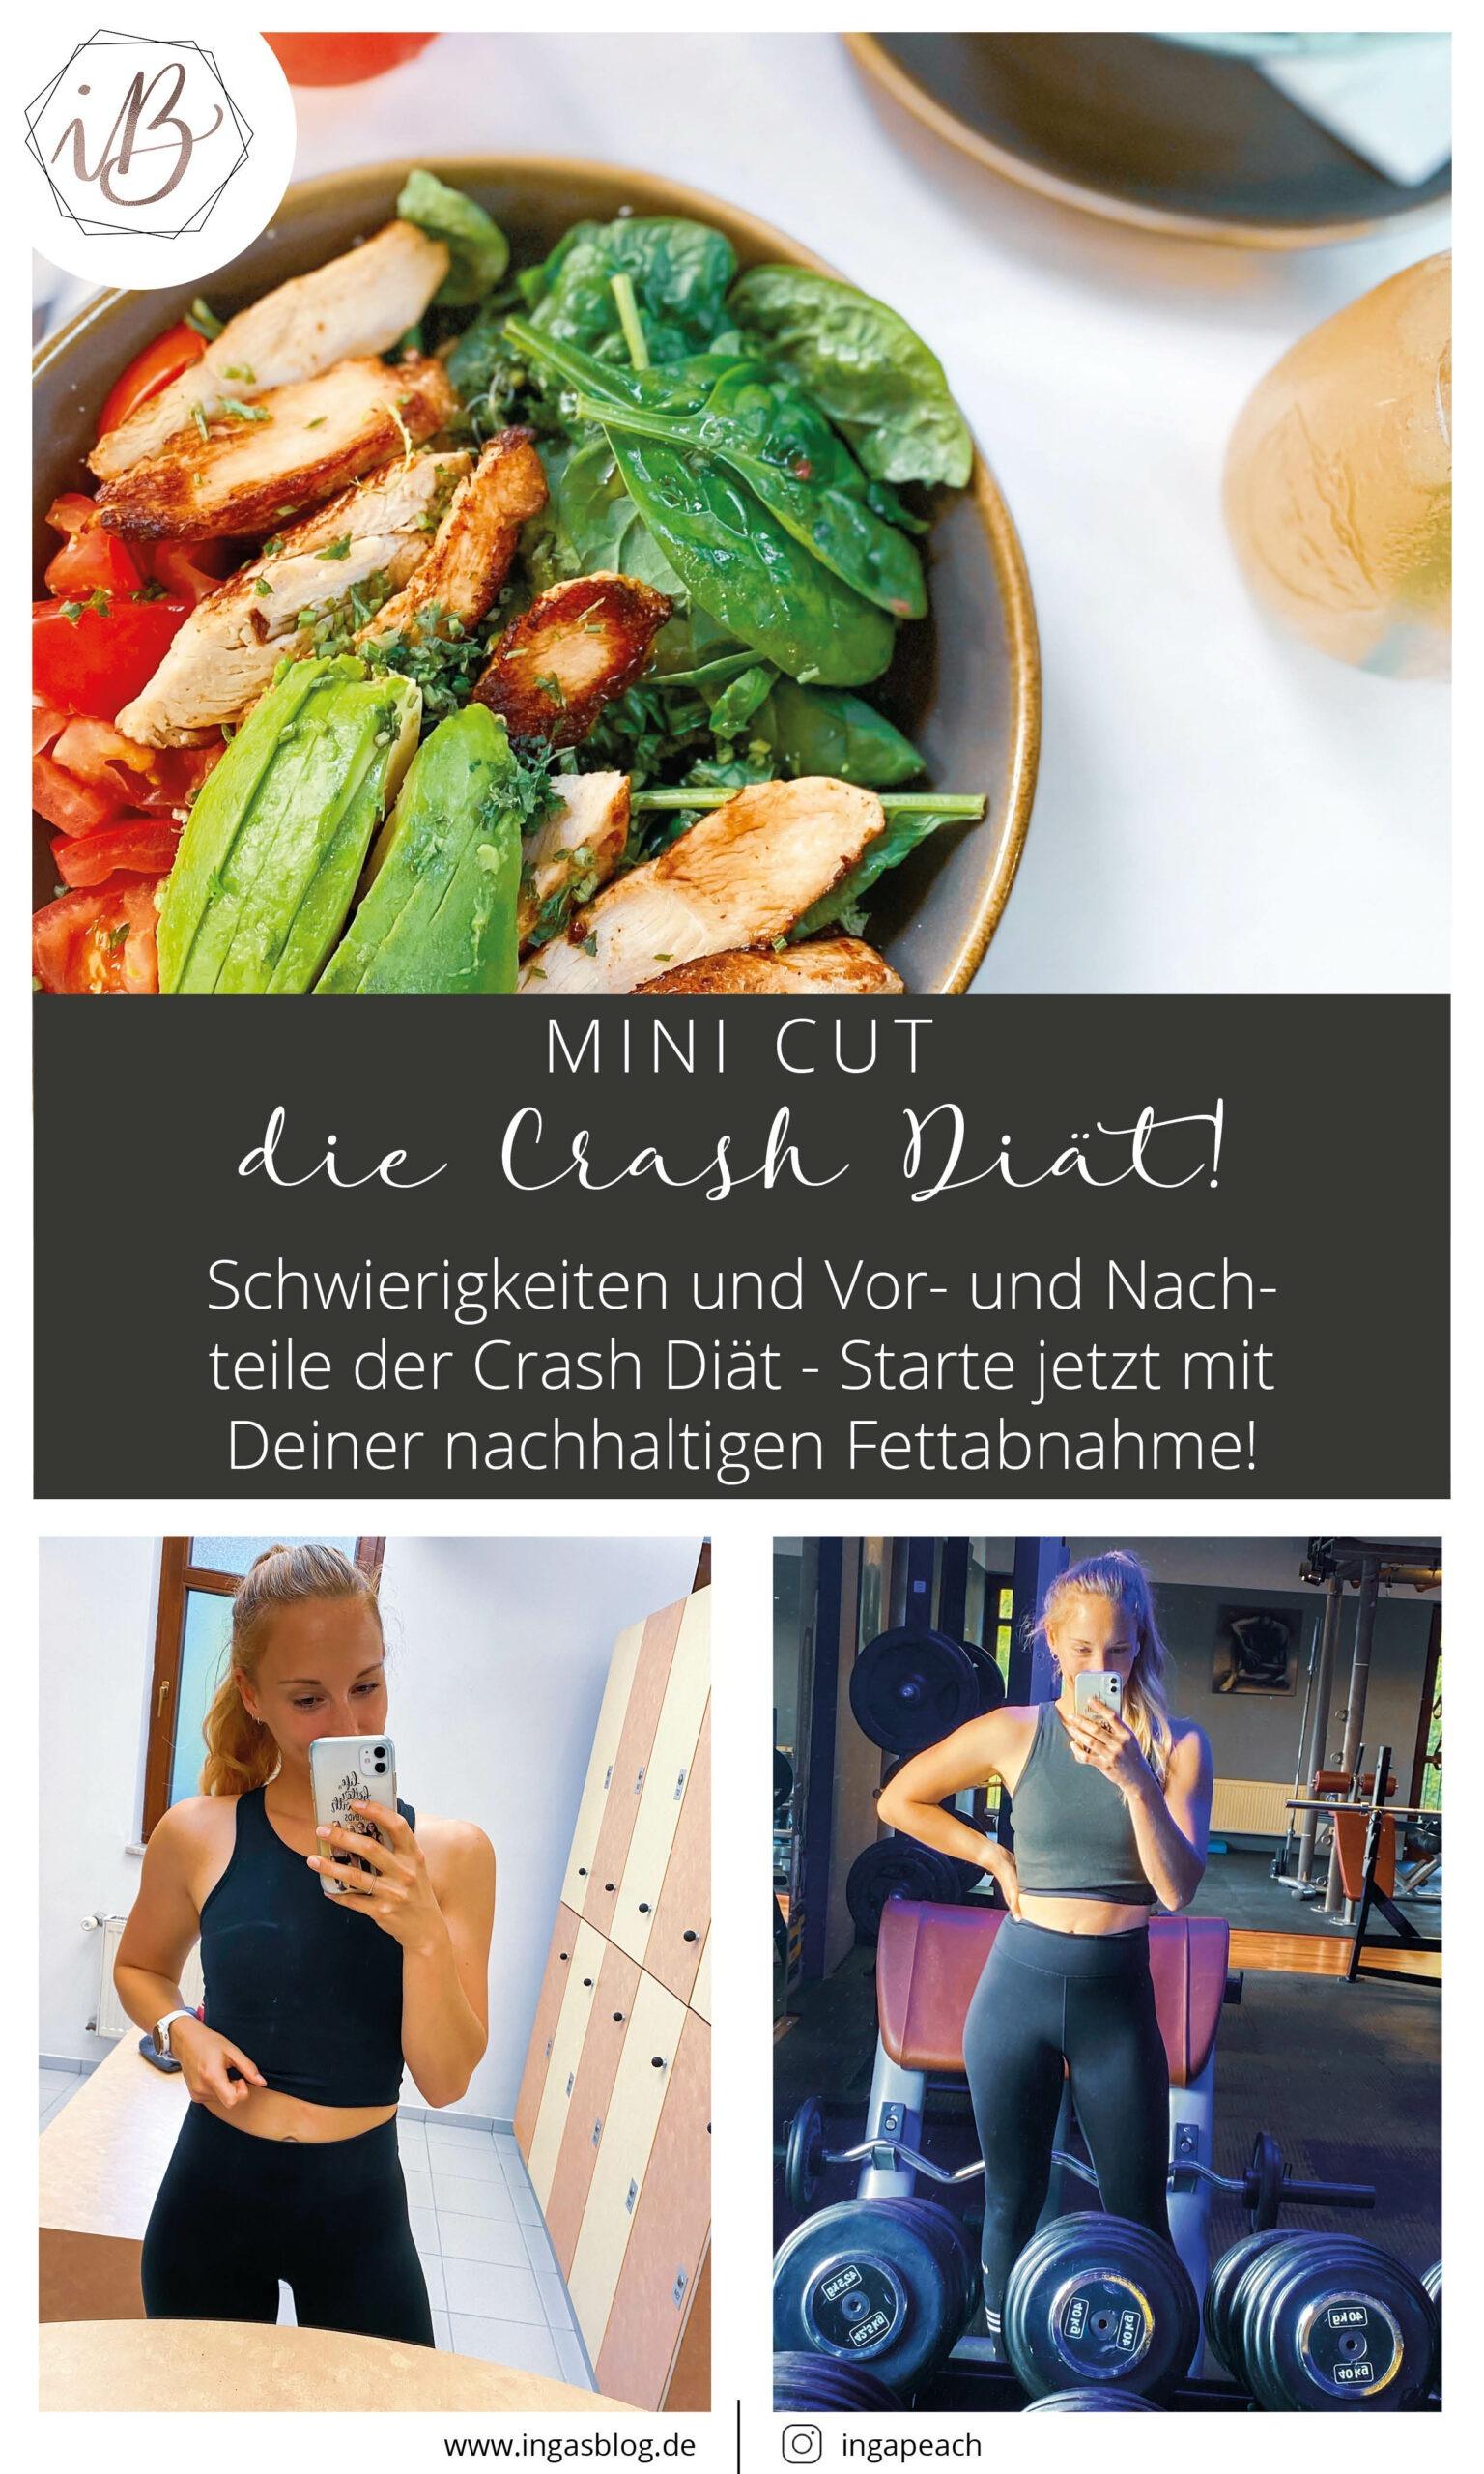 Mini Cut - die Crash Diät Teil 2